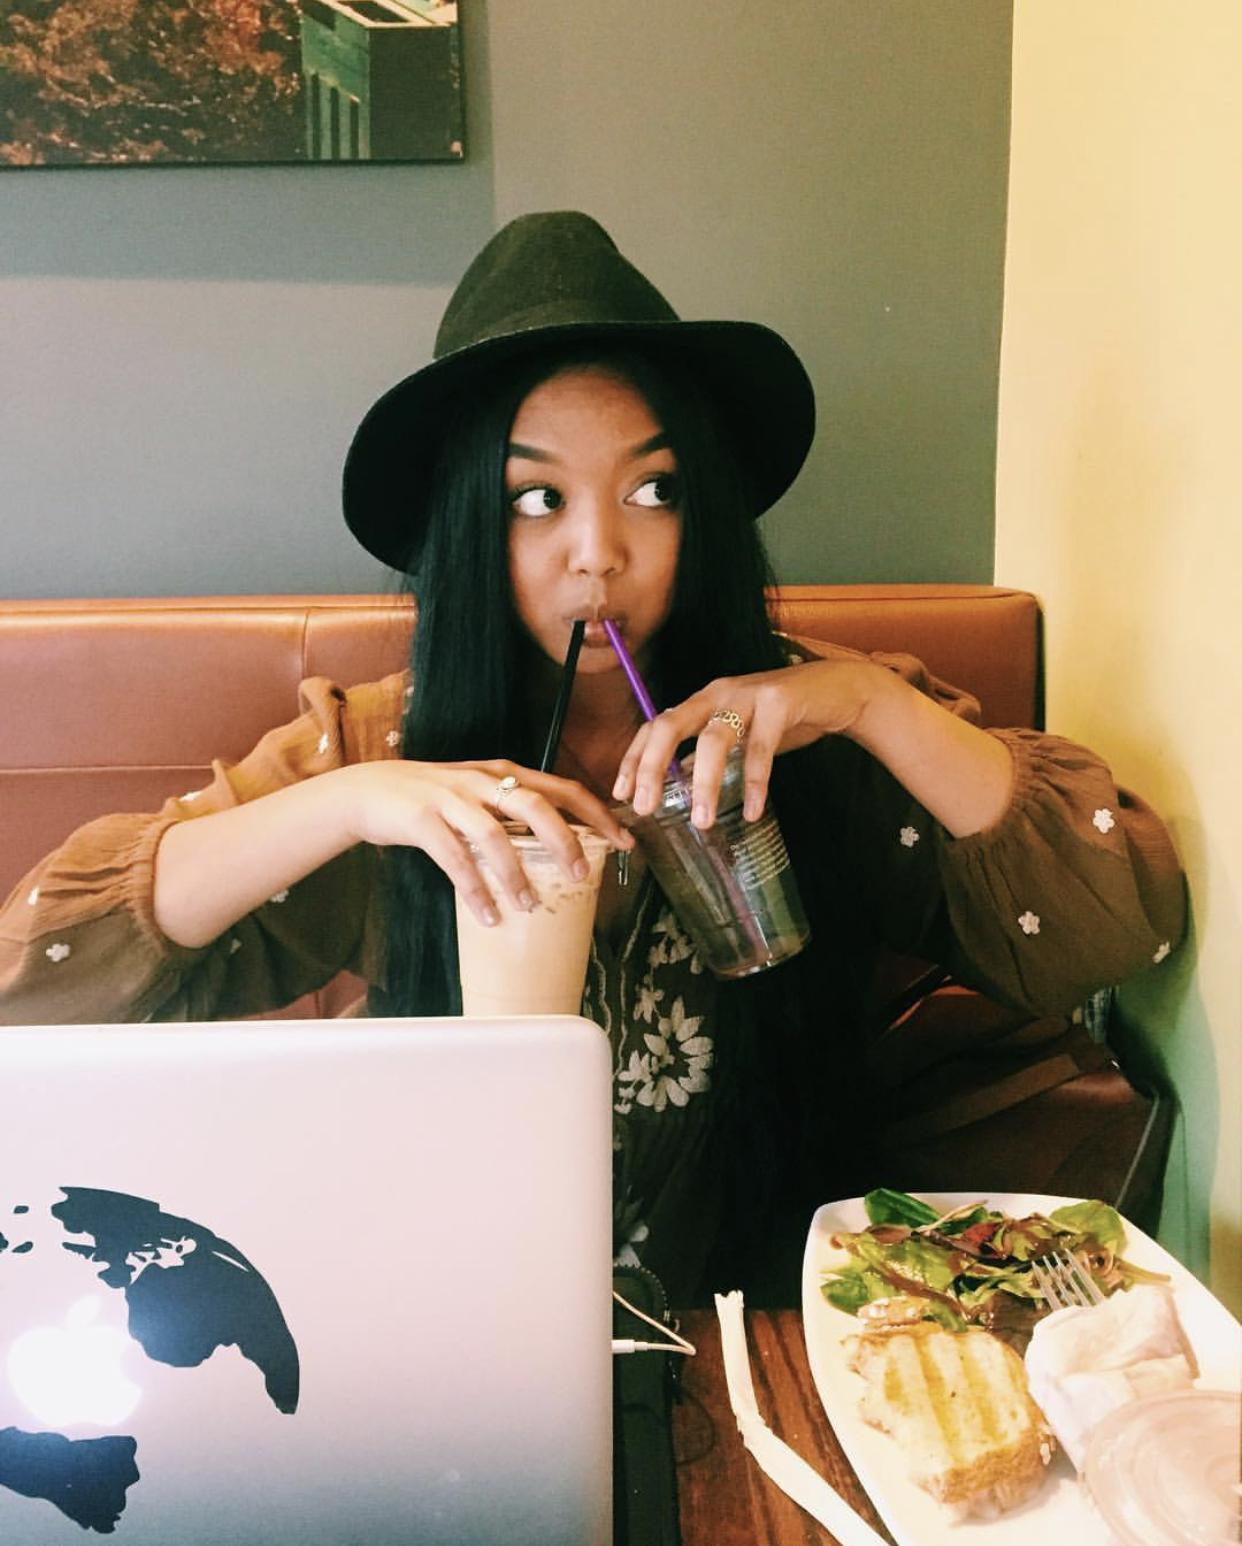 Aubrey Sipping Coffee